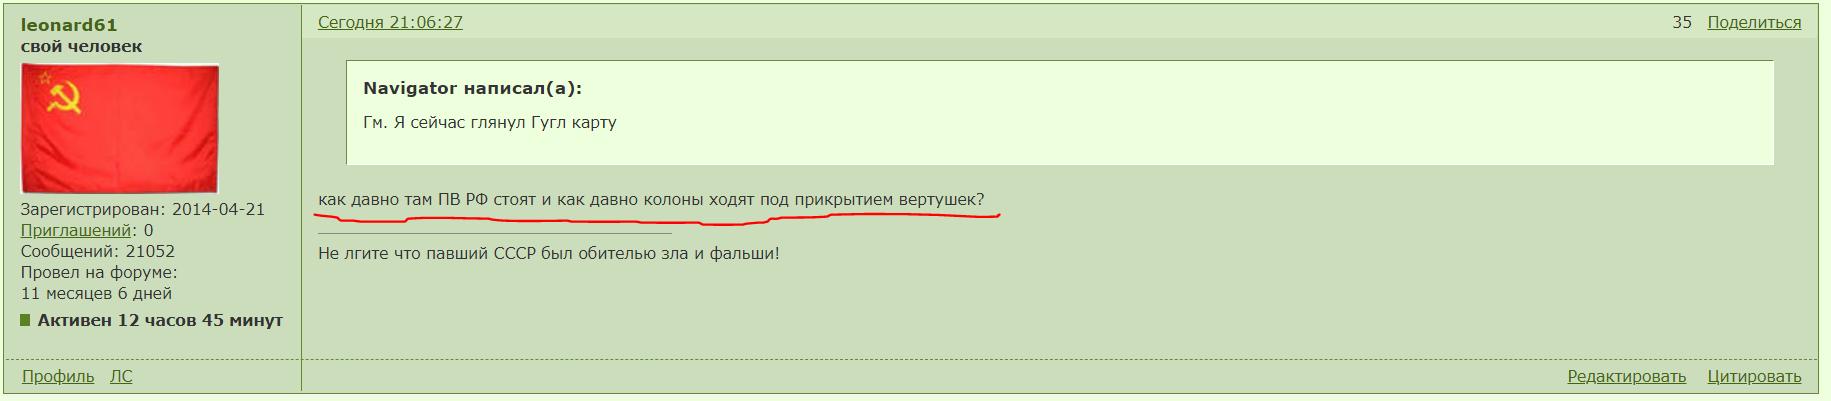 https://images.vfl.ru/ii/1604943630/874fa152/32245429.png